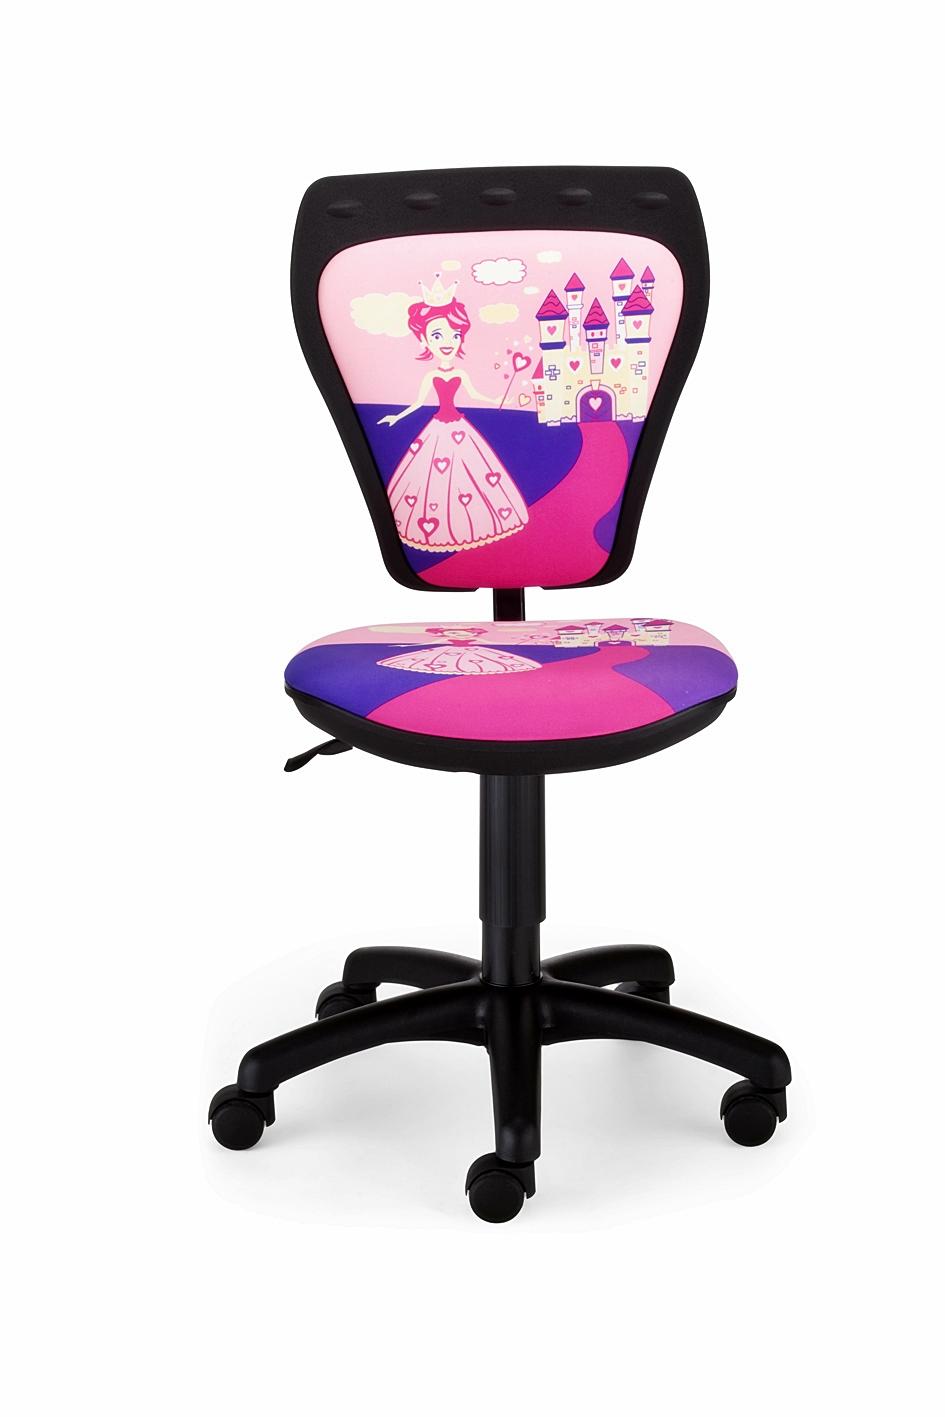 Kinder-Drehstuhl mit Prinzessin Motiv